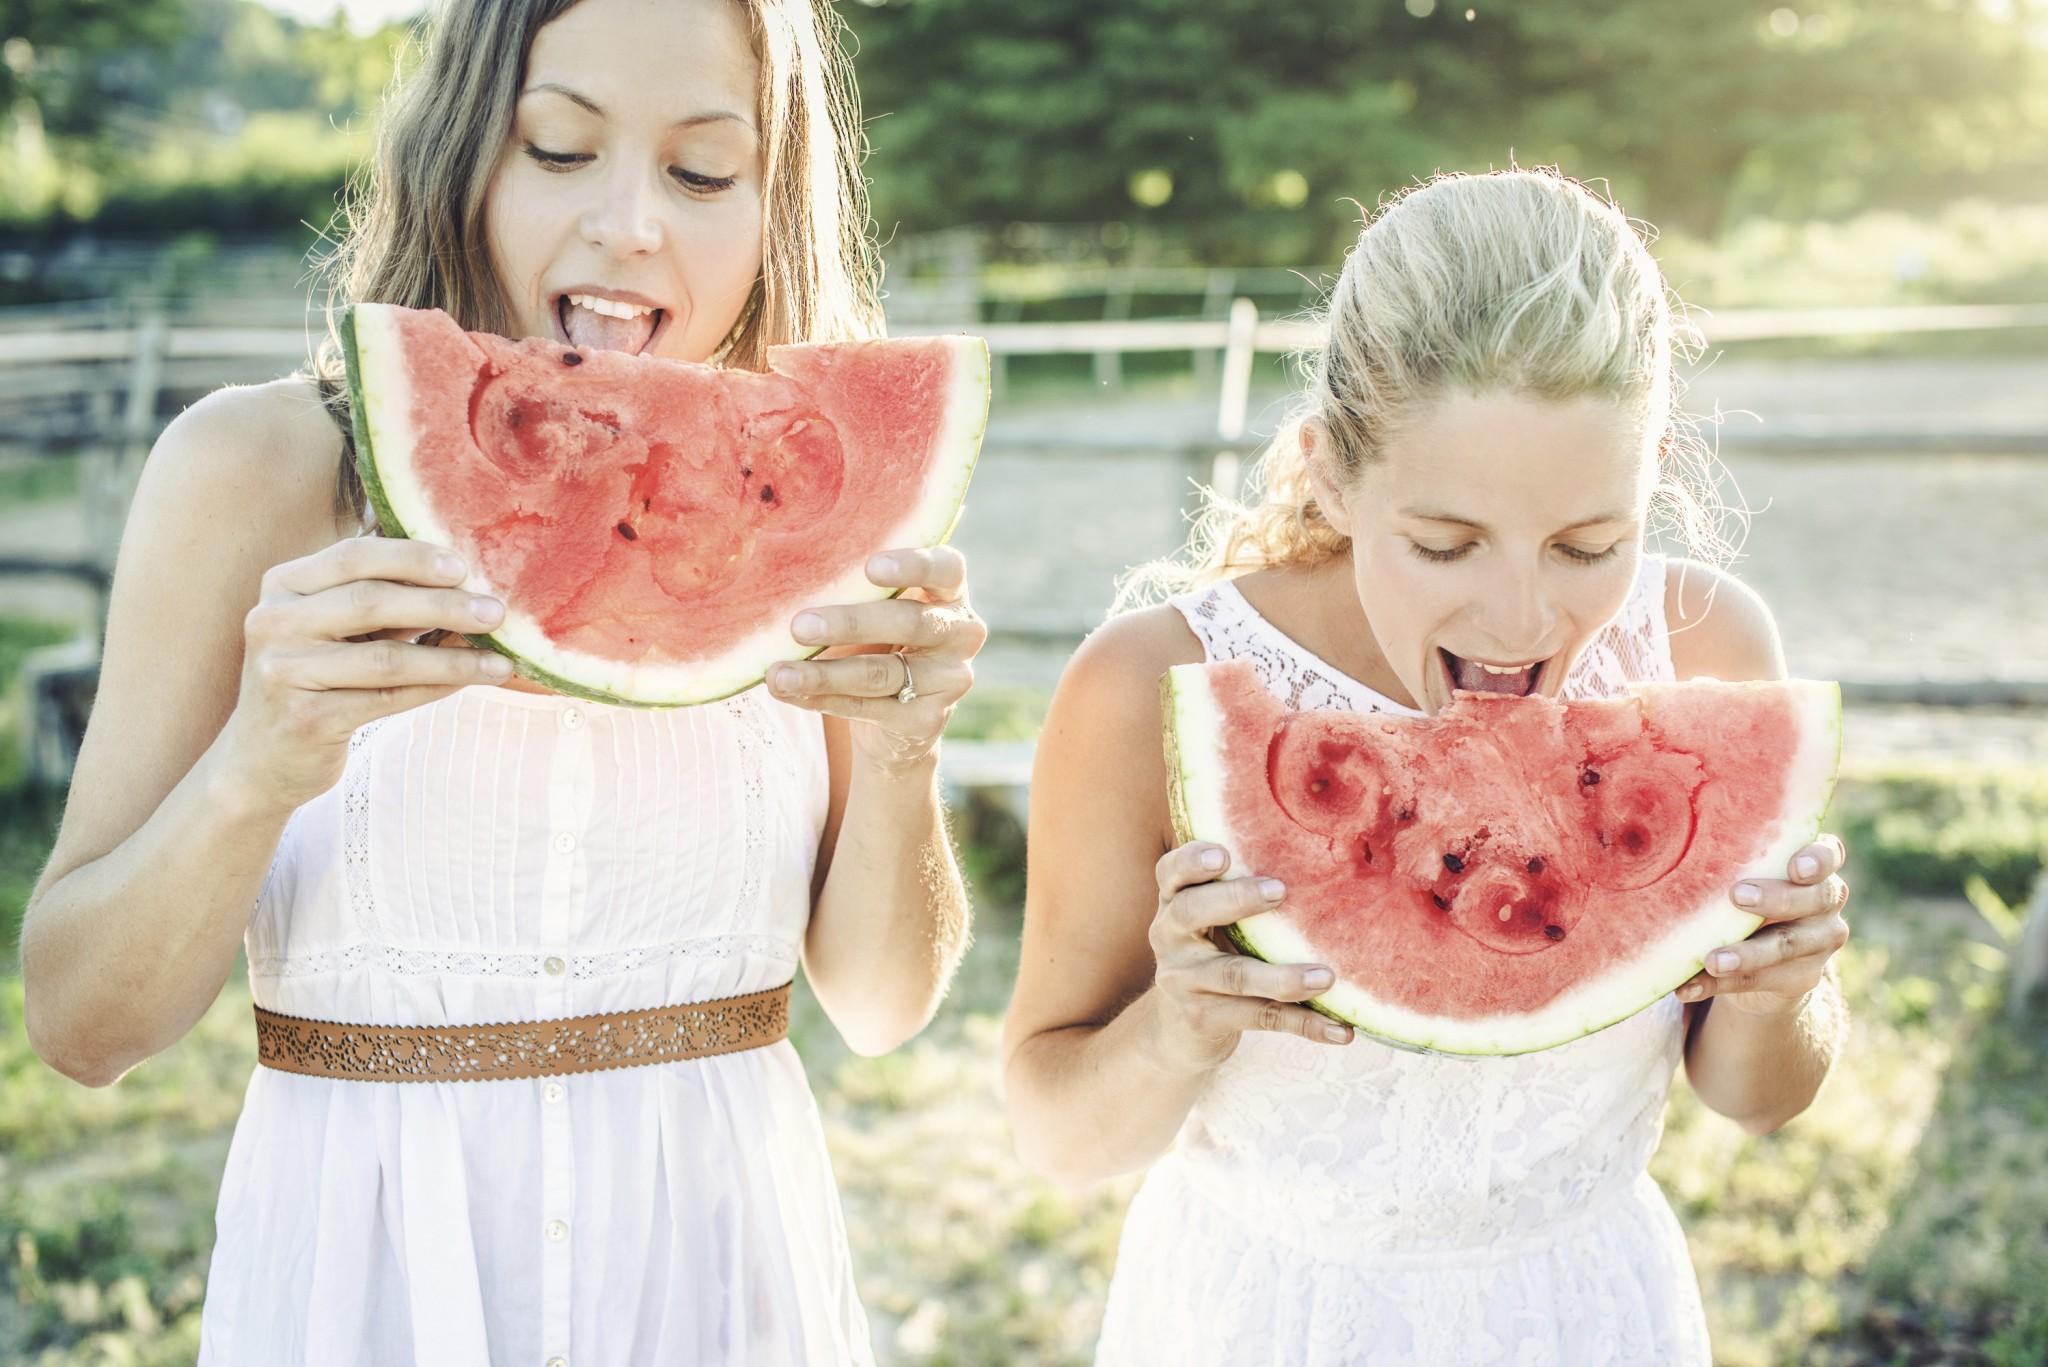 femei pepene remedii naturiste emotii negative